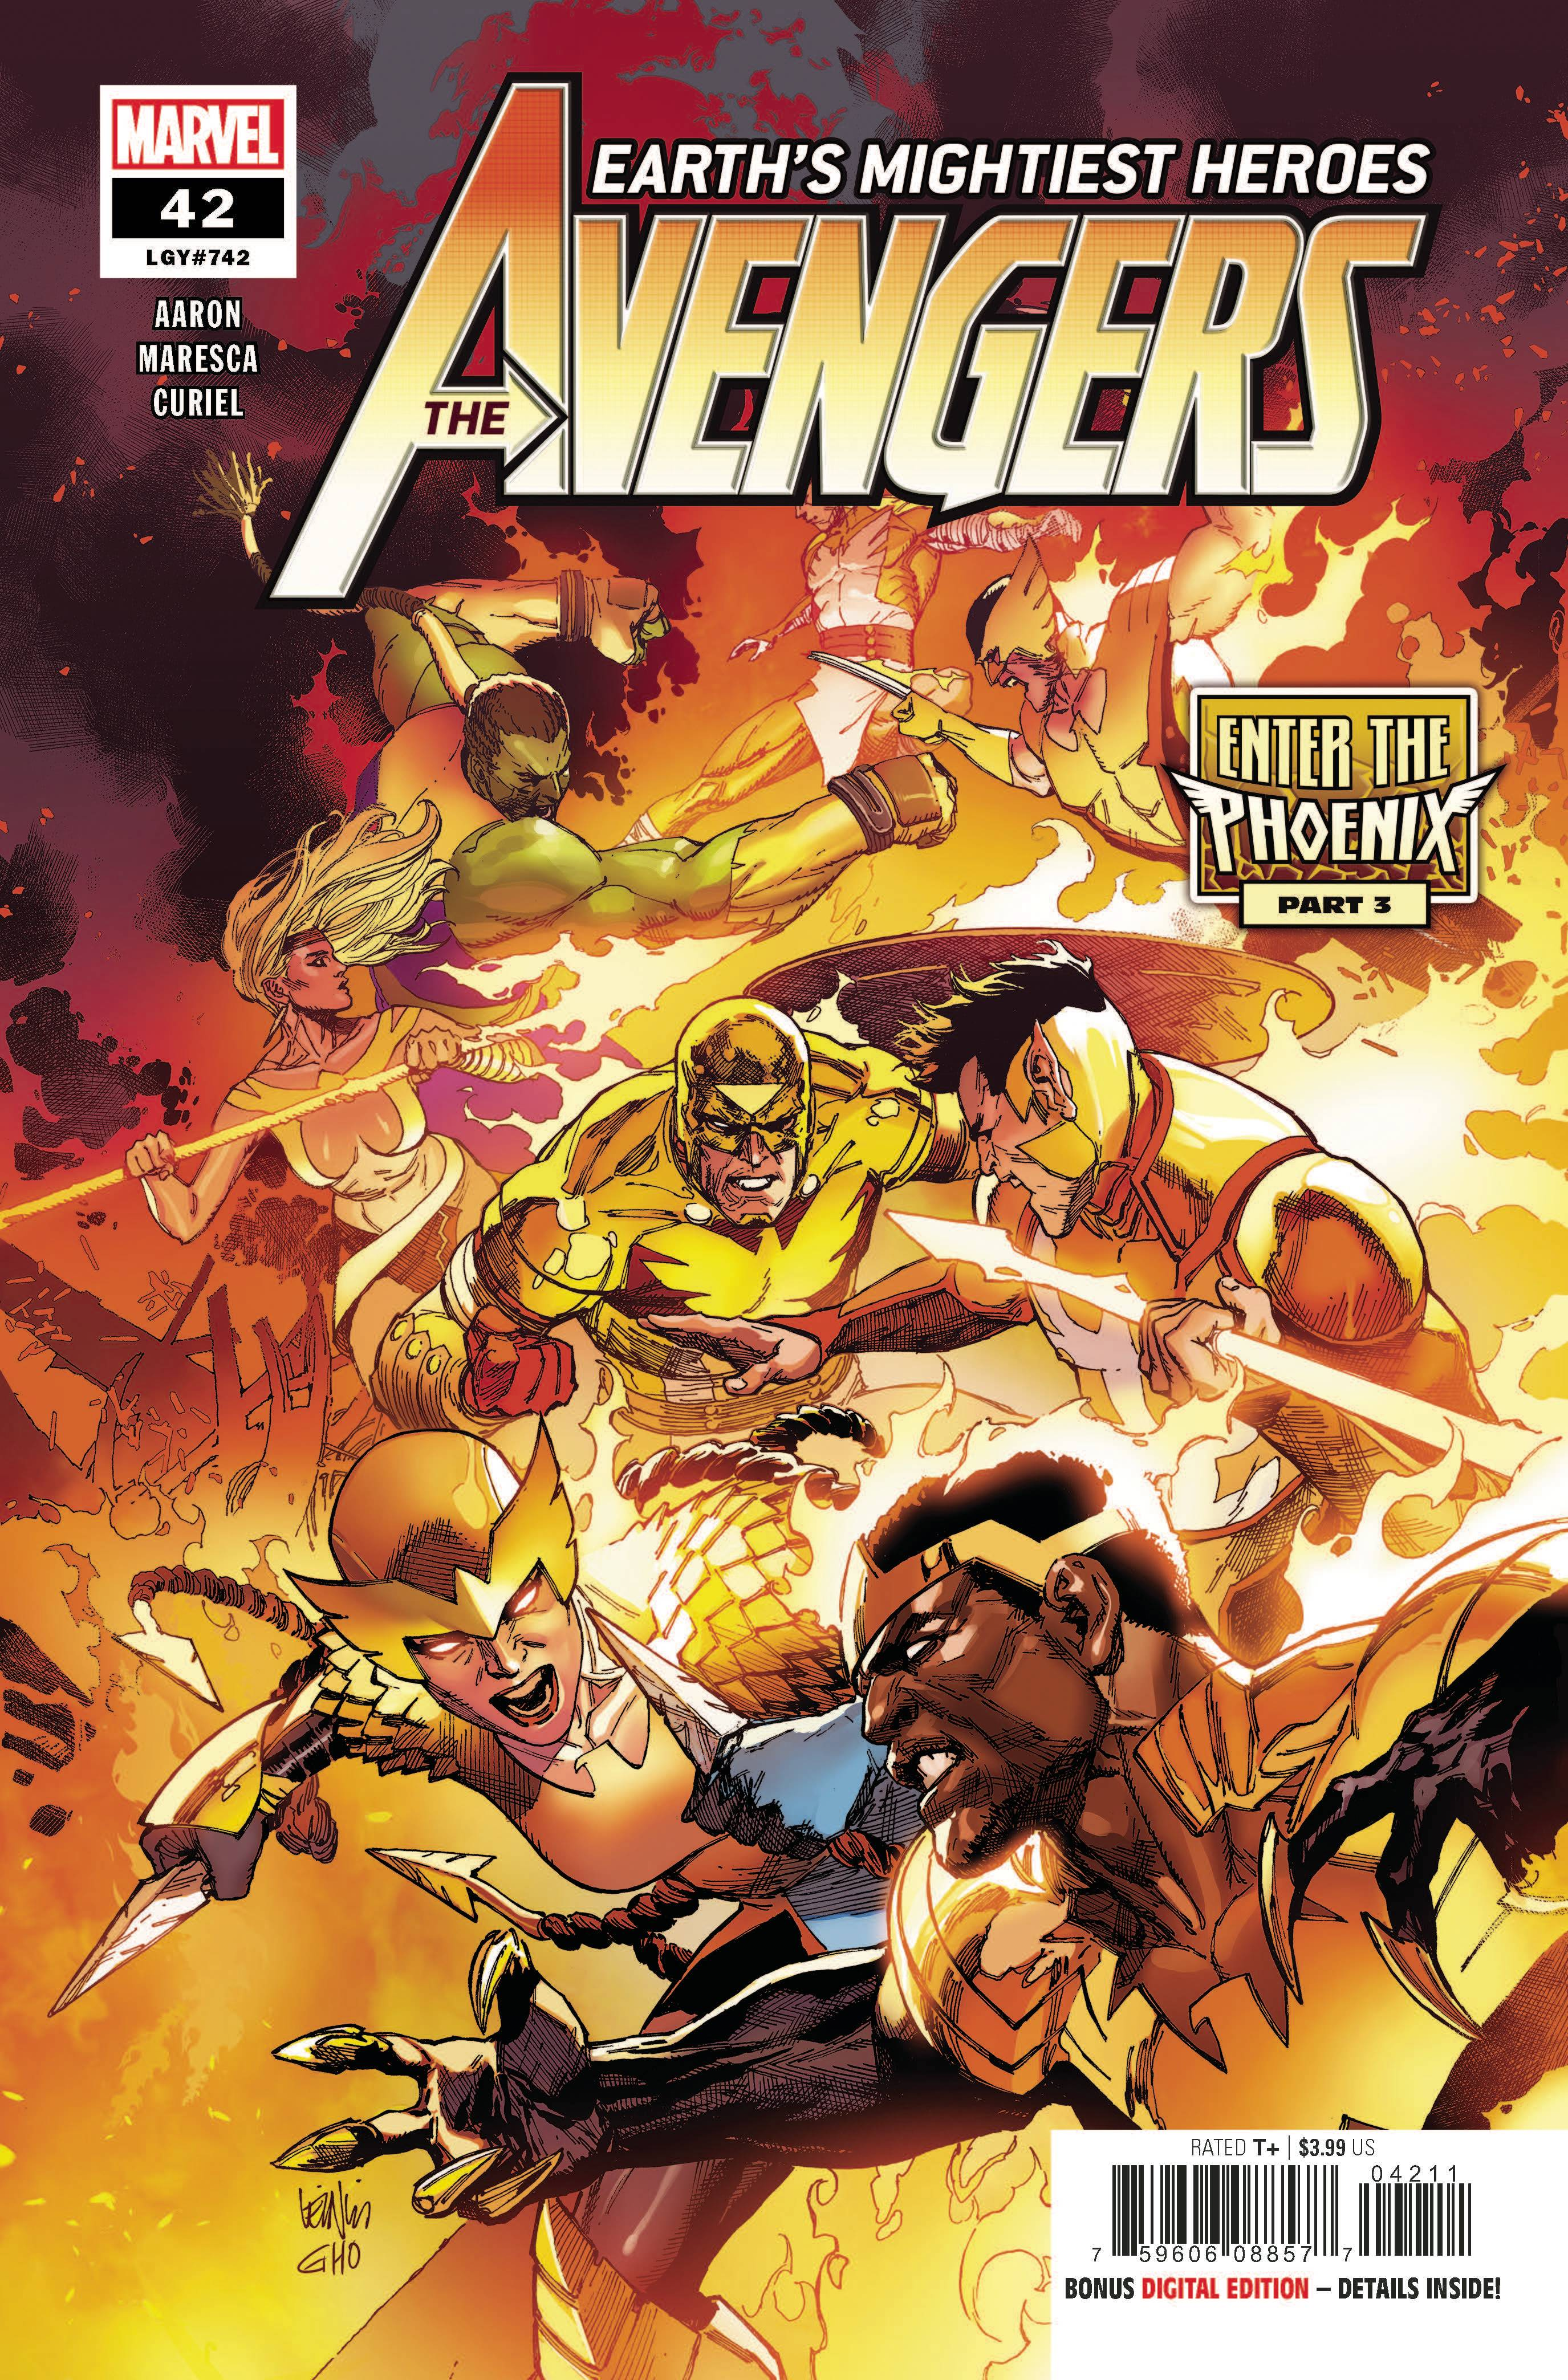 Avengers: Earth's Mightiest Heroes #42 (2021)